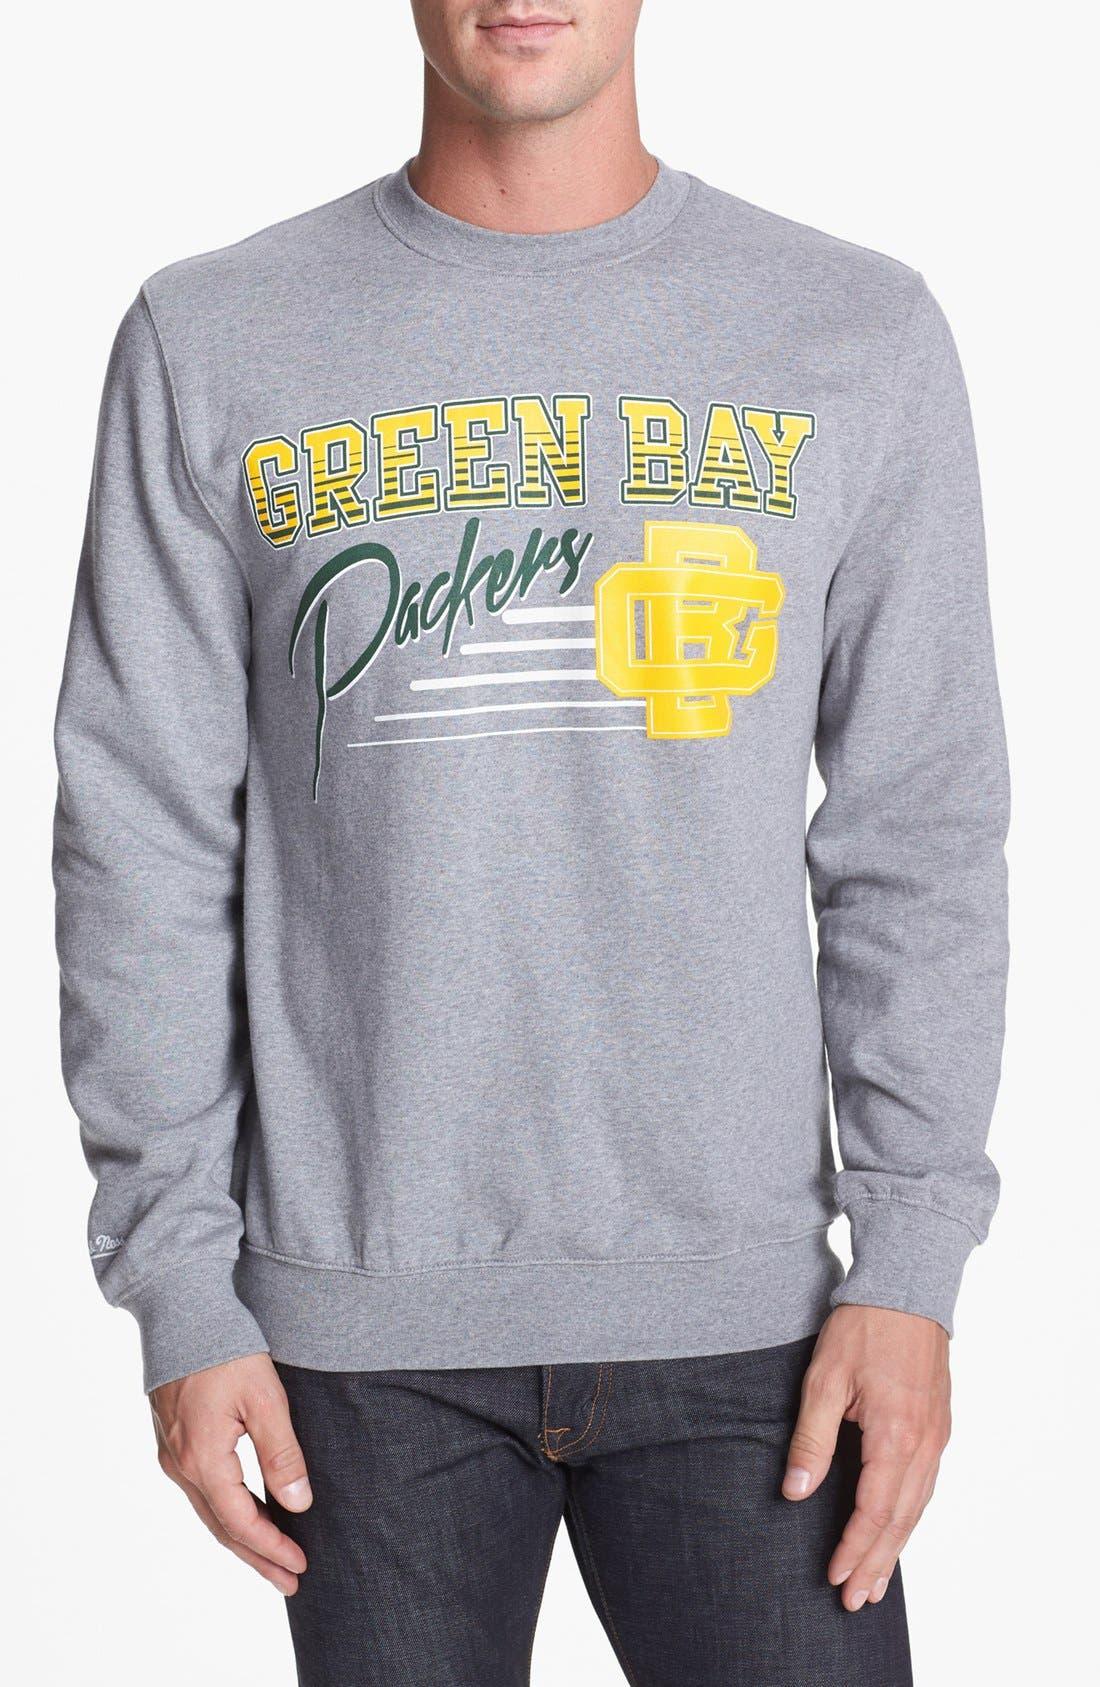 Alternate Image 1 Selected - Mitchell & Ness 'Green Bay Packers' Sweatshirt